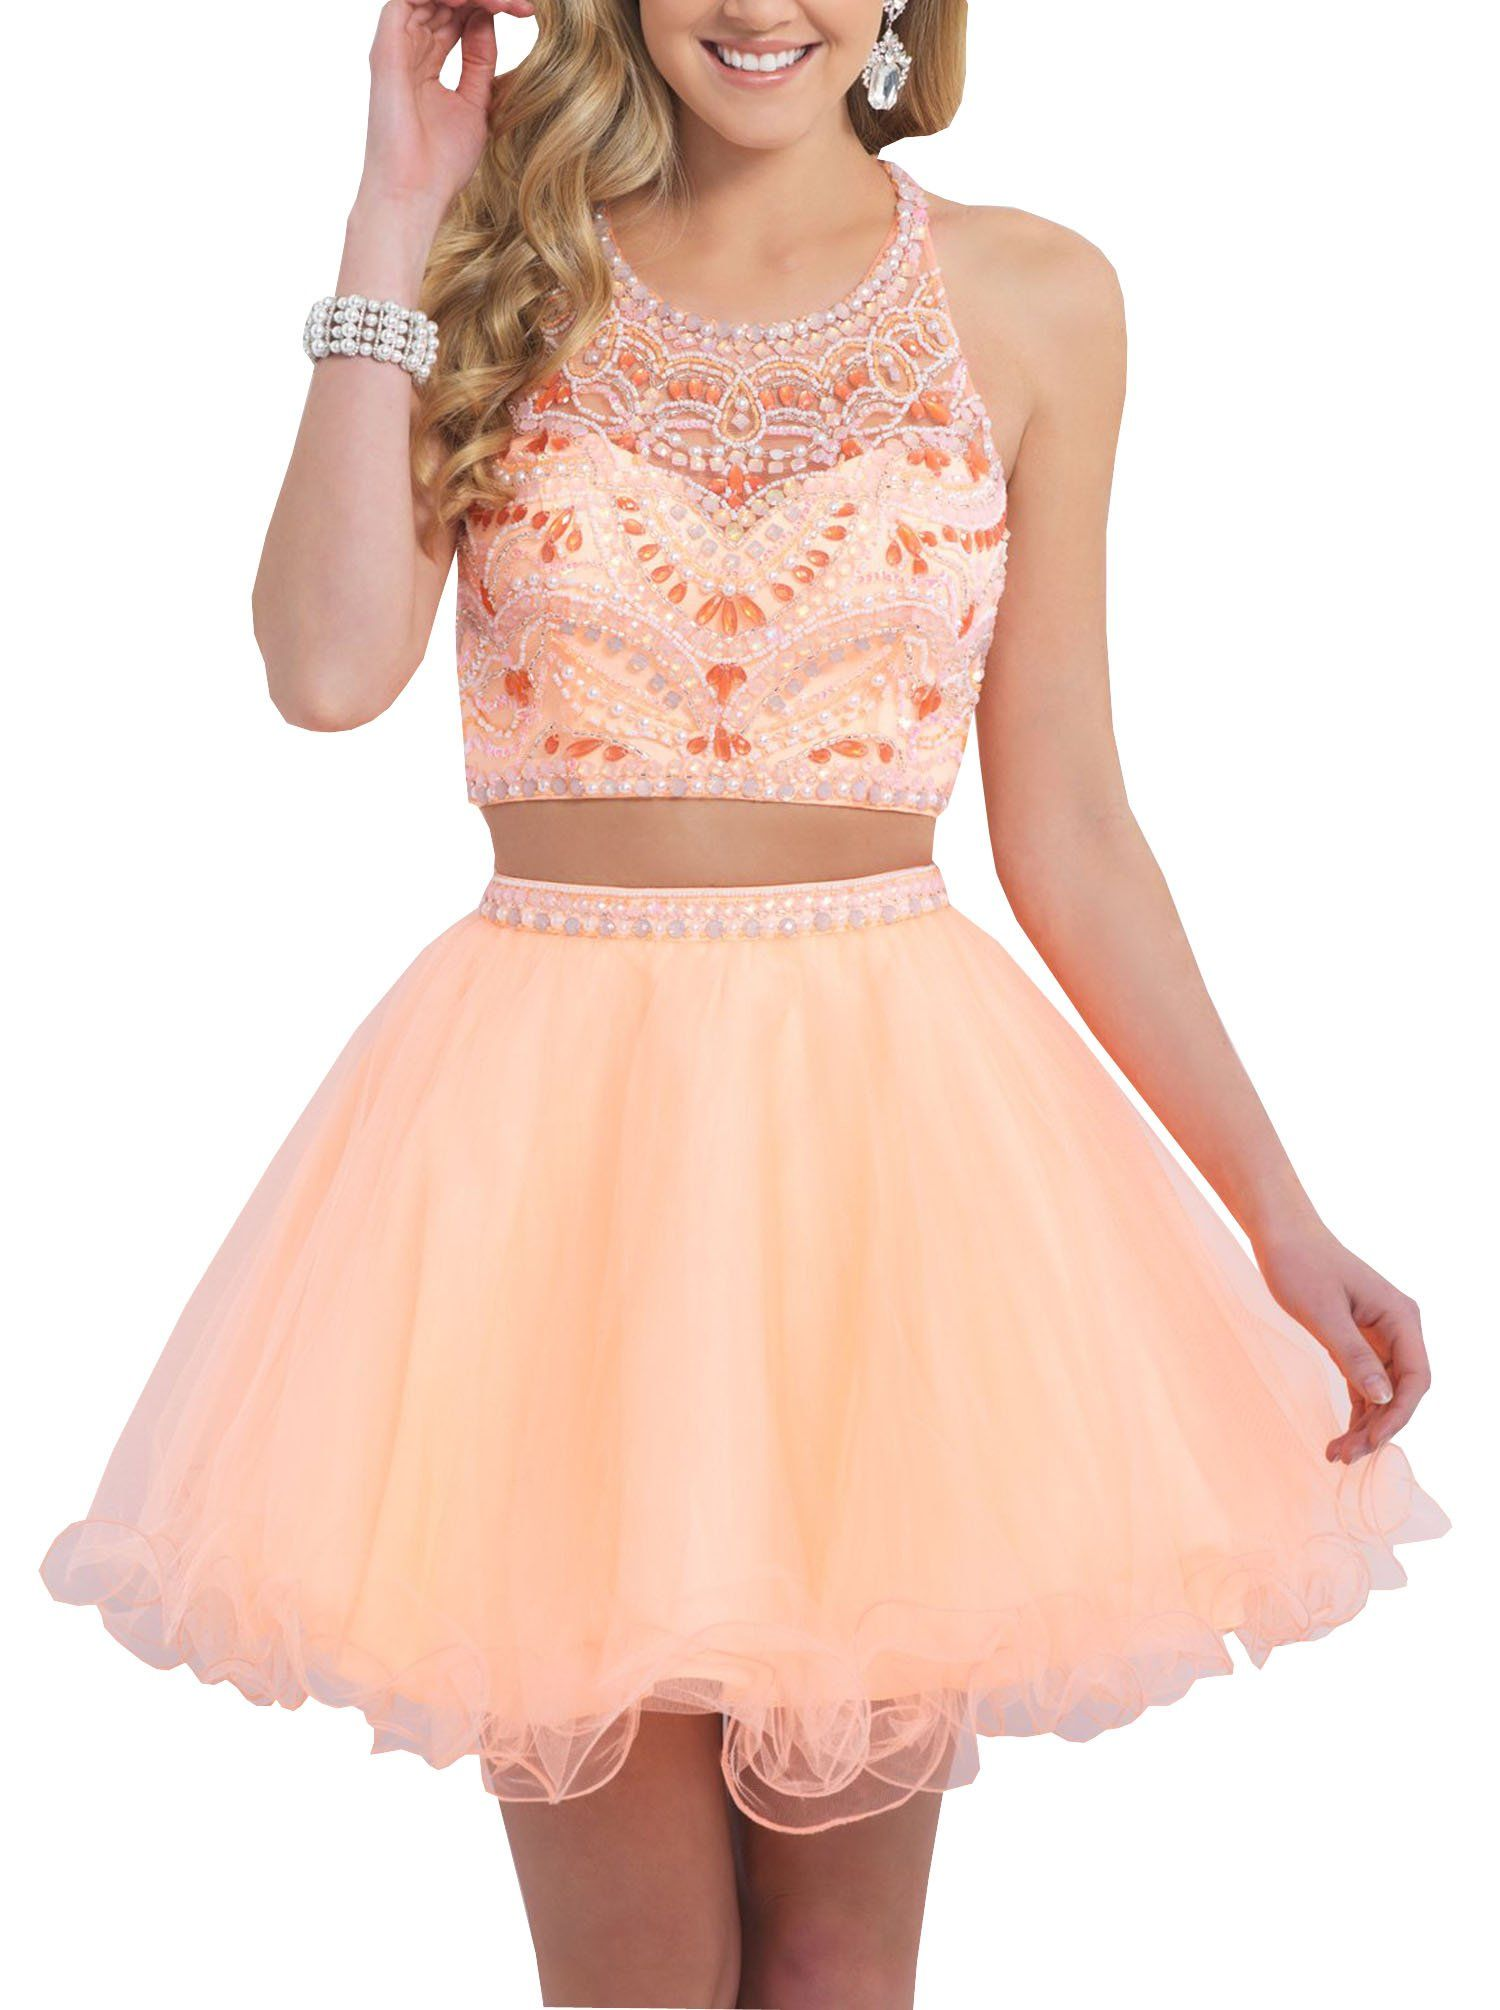 Dressonline two piece rhinestone flowing chiffon short prom dress